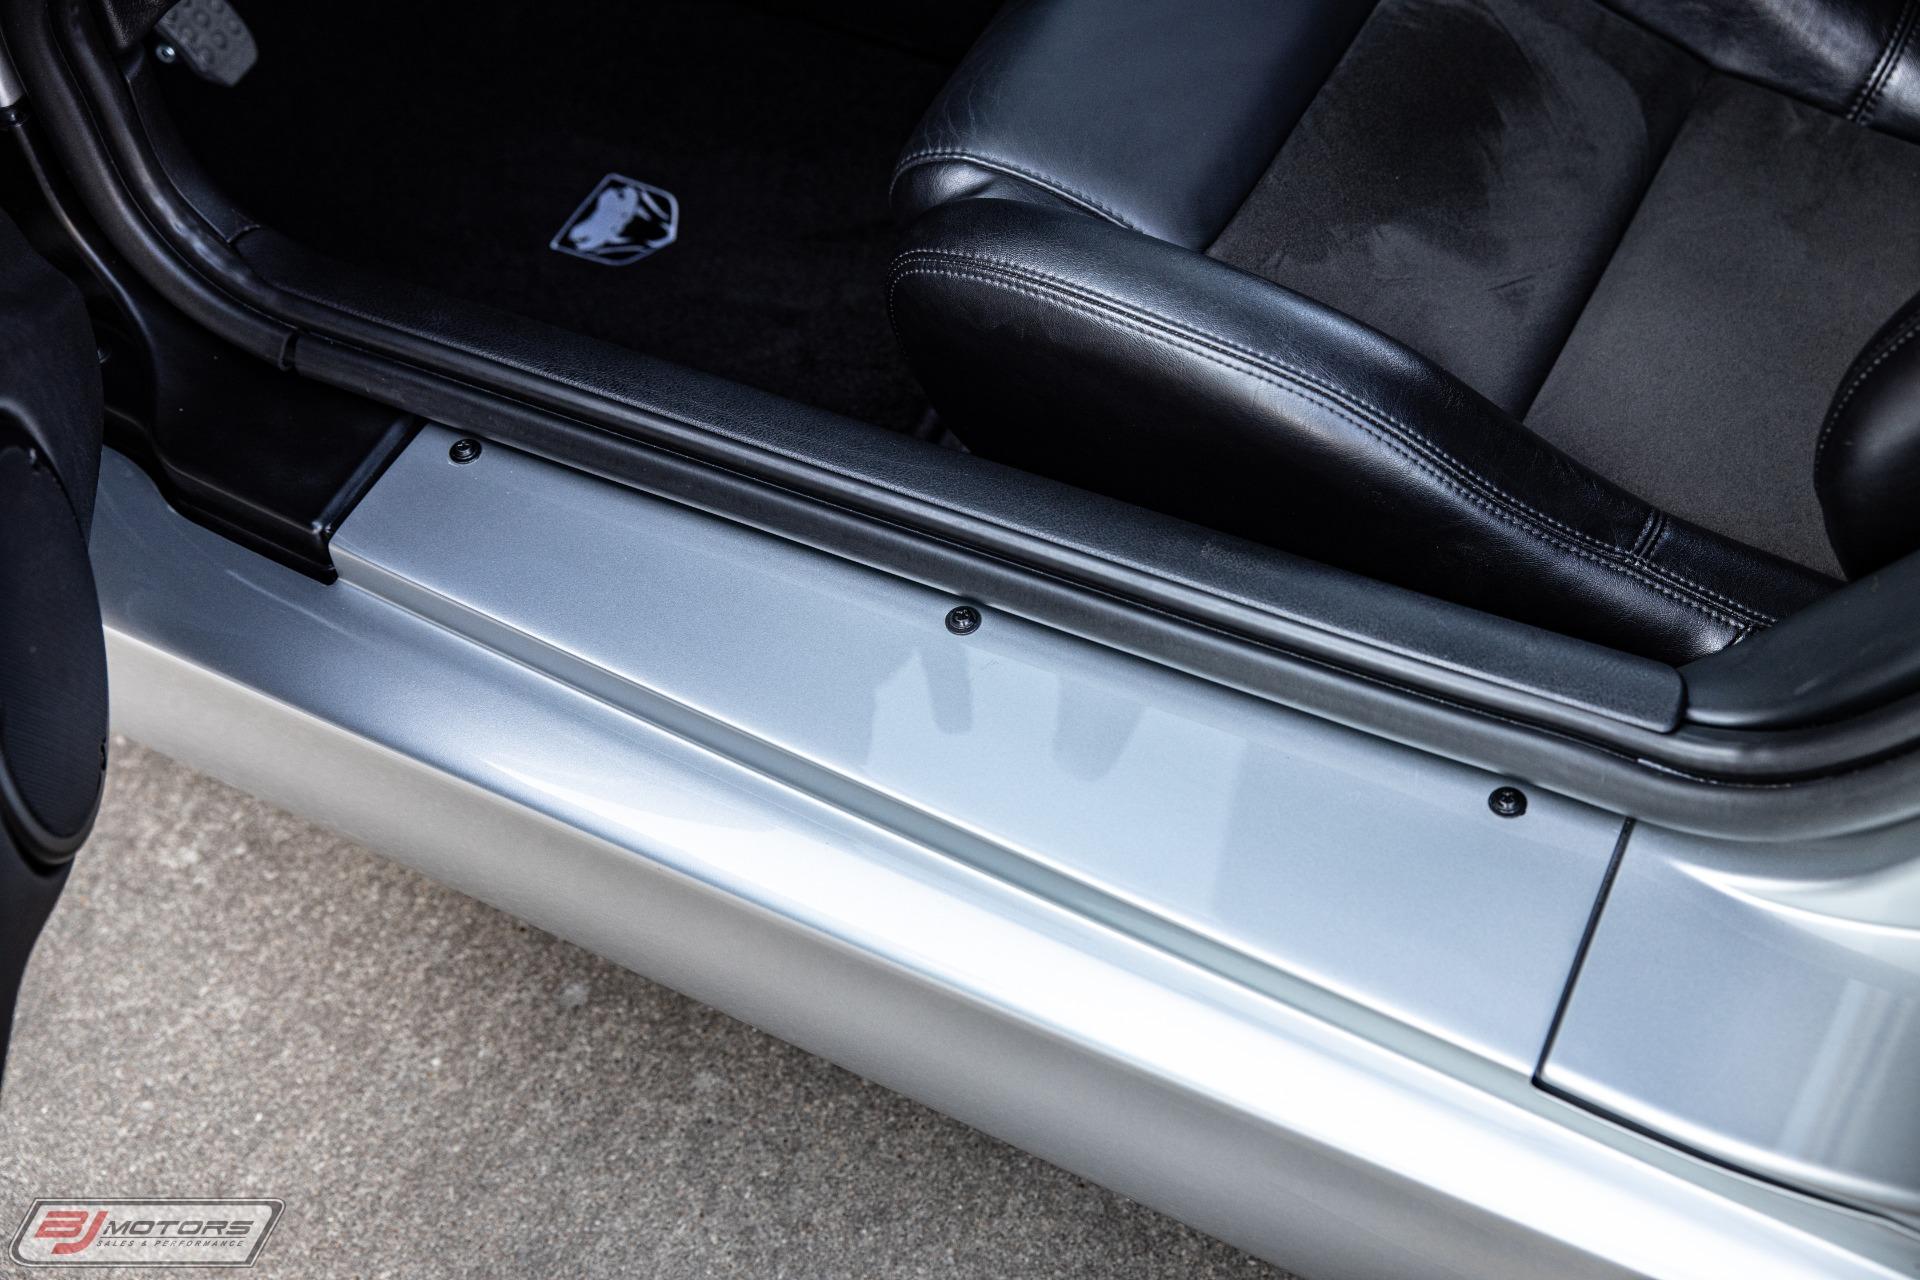 Used-2009-Dodge-Viper-SRT-10-VOIX-VCA-Raffle-Car-1-of-1-Built